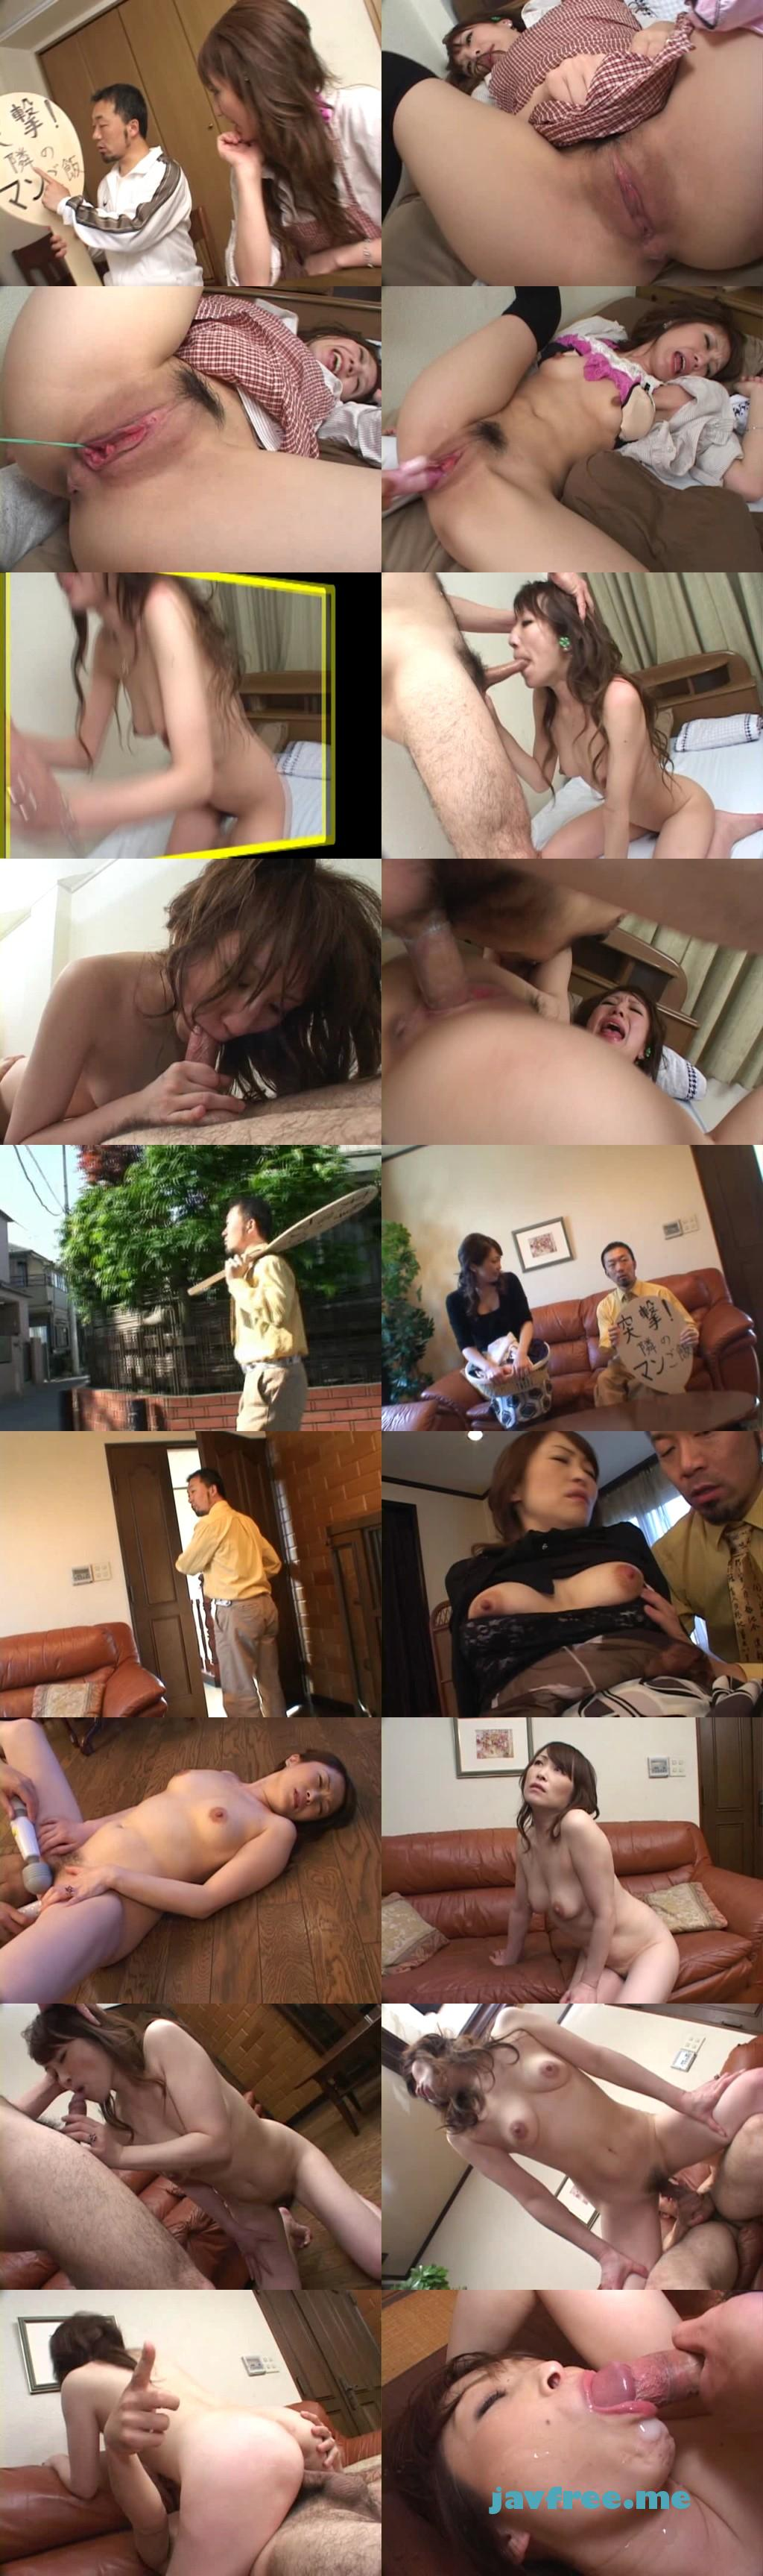 [RHJ 070] Red Hot Jam Vol.70 : Mayumi Takazawa, Sayoko Kuroki 黒木小夜子 高沢真弓 Sayoko Kuroki RHJ Mayumi Takazawa